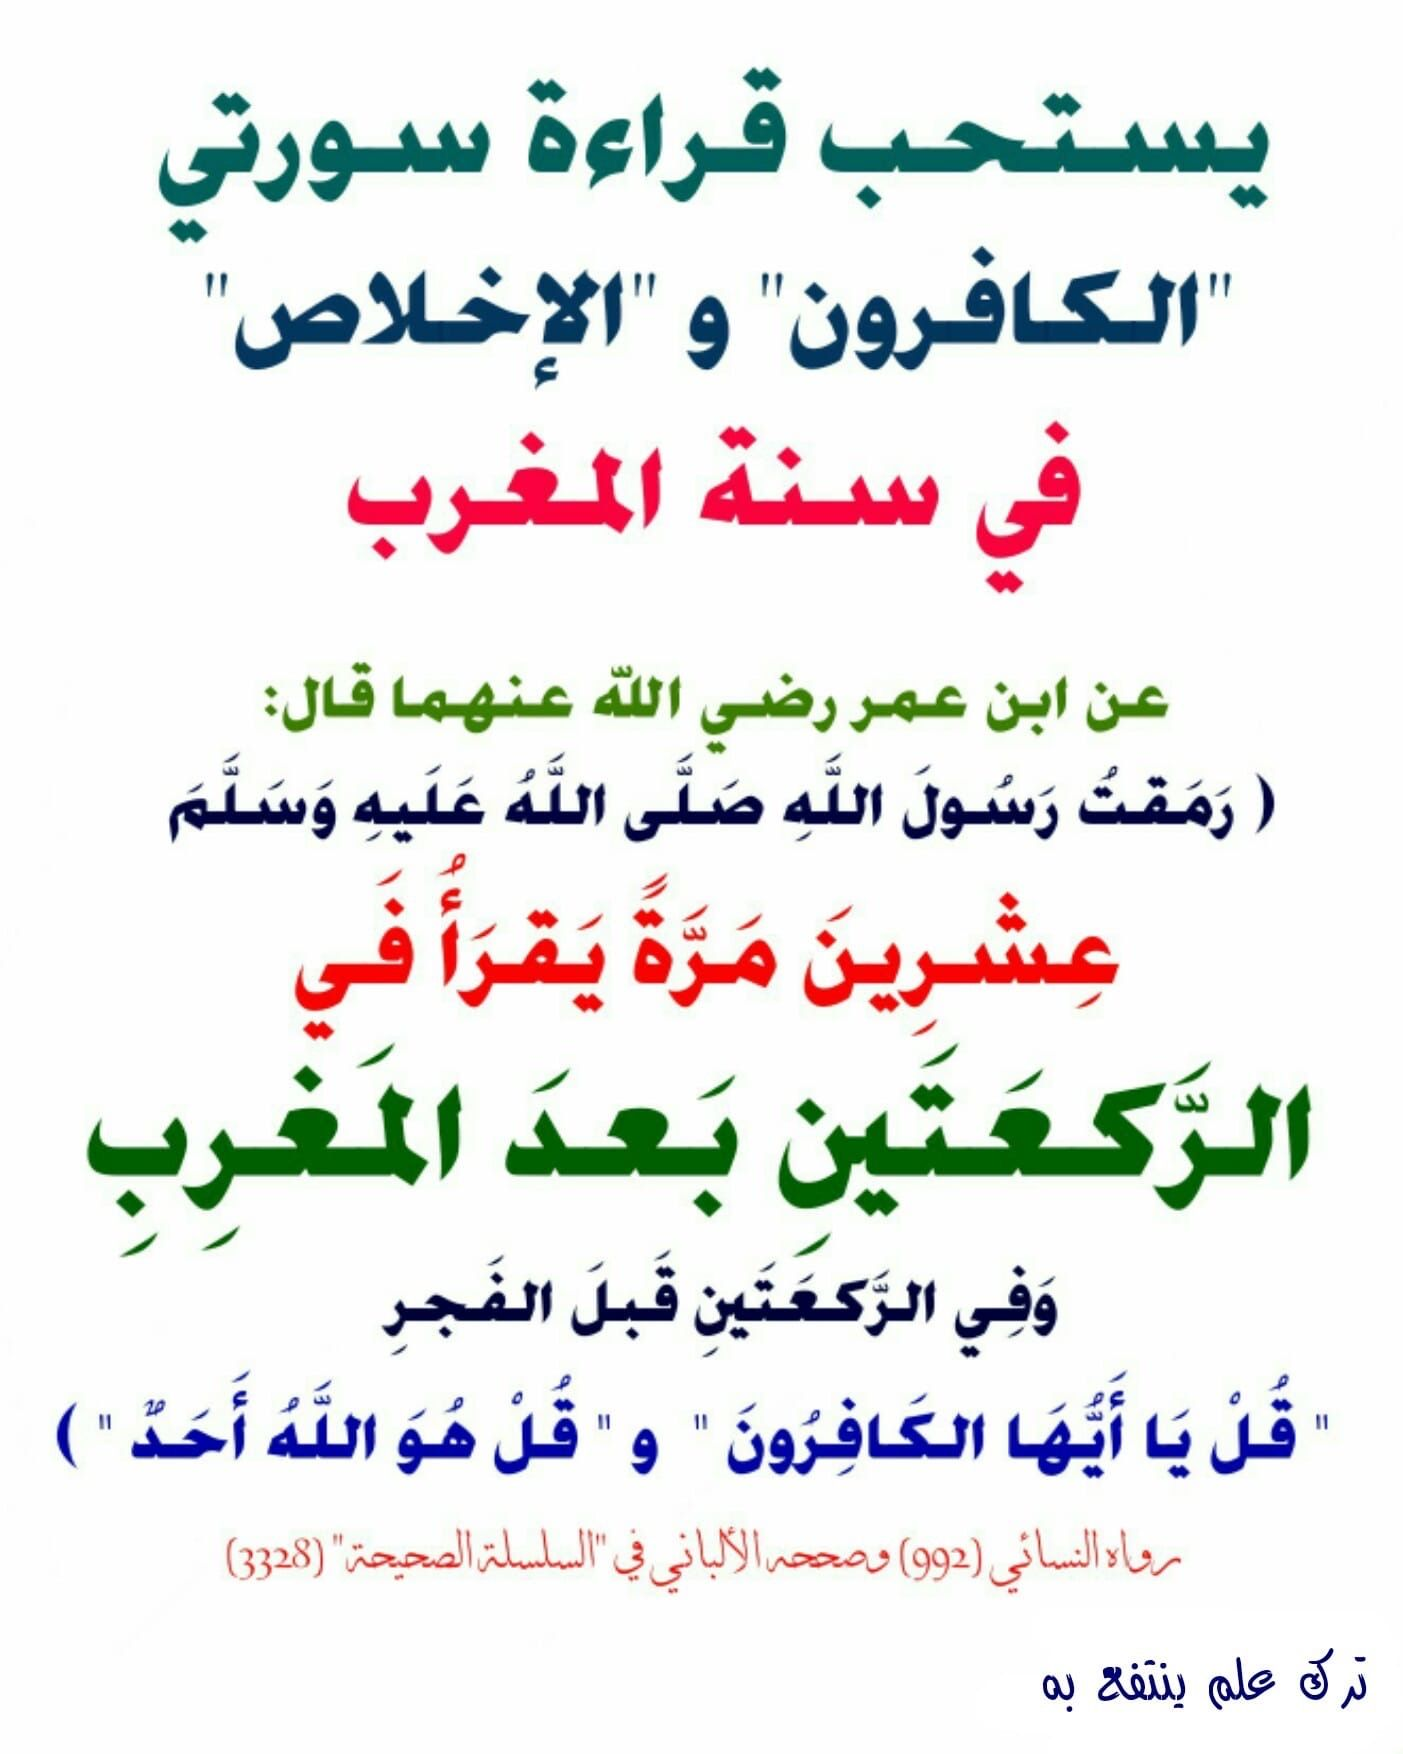 Pin By الأثر الجميل On أقوال الصحابة والعلماء Islam Quran Quran Islam